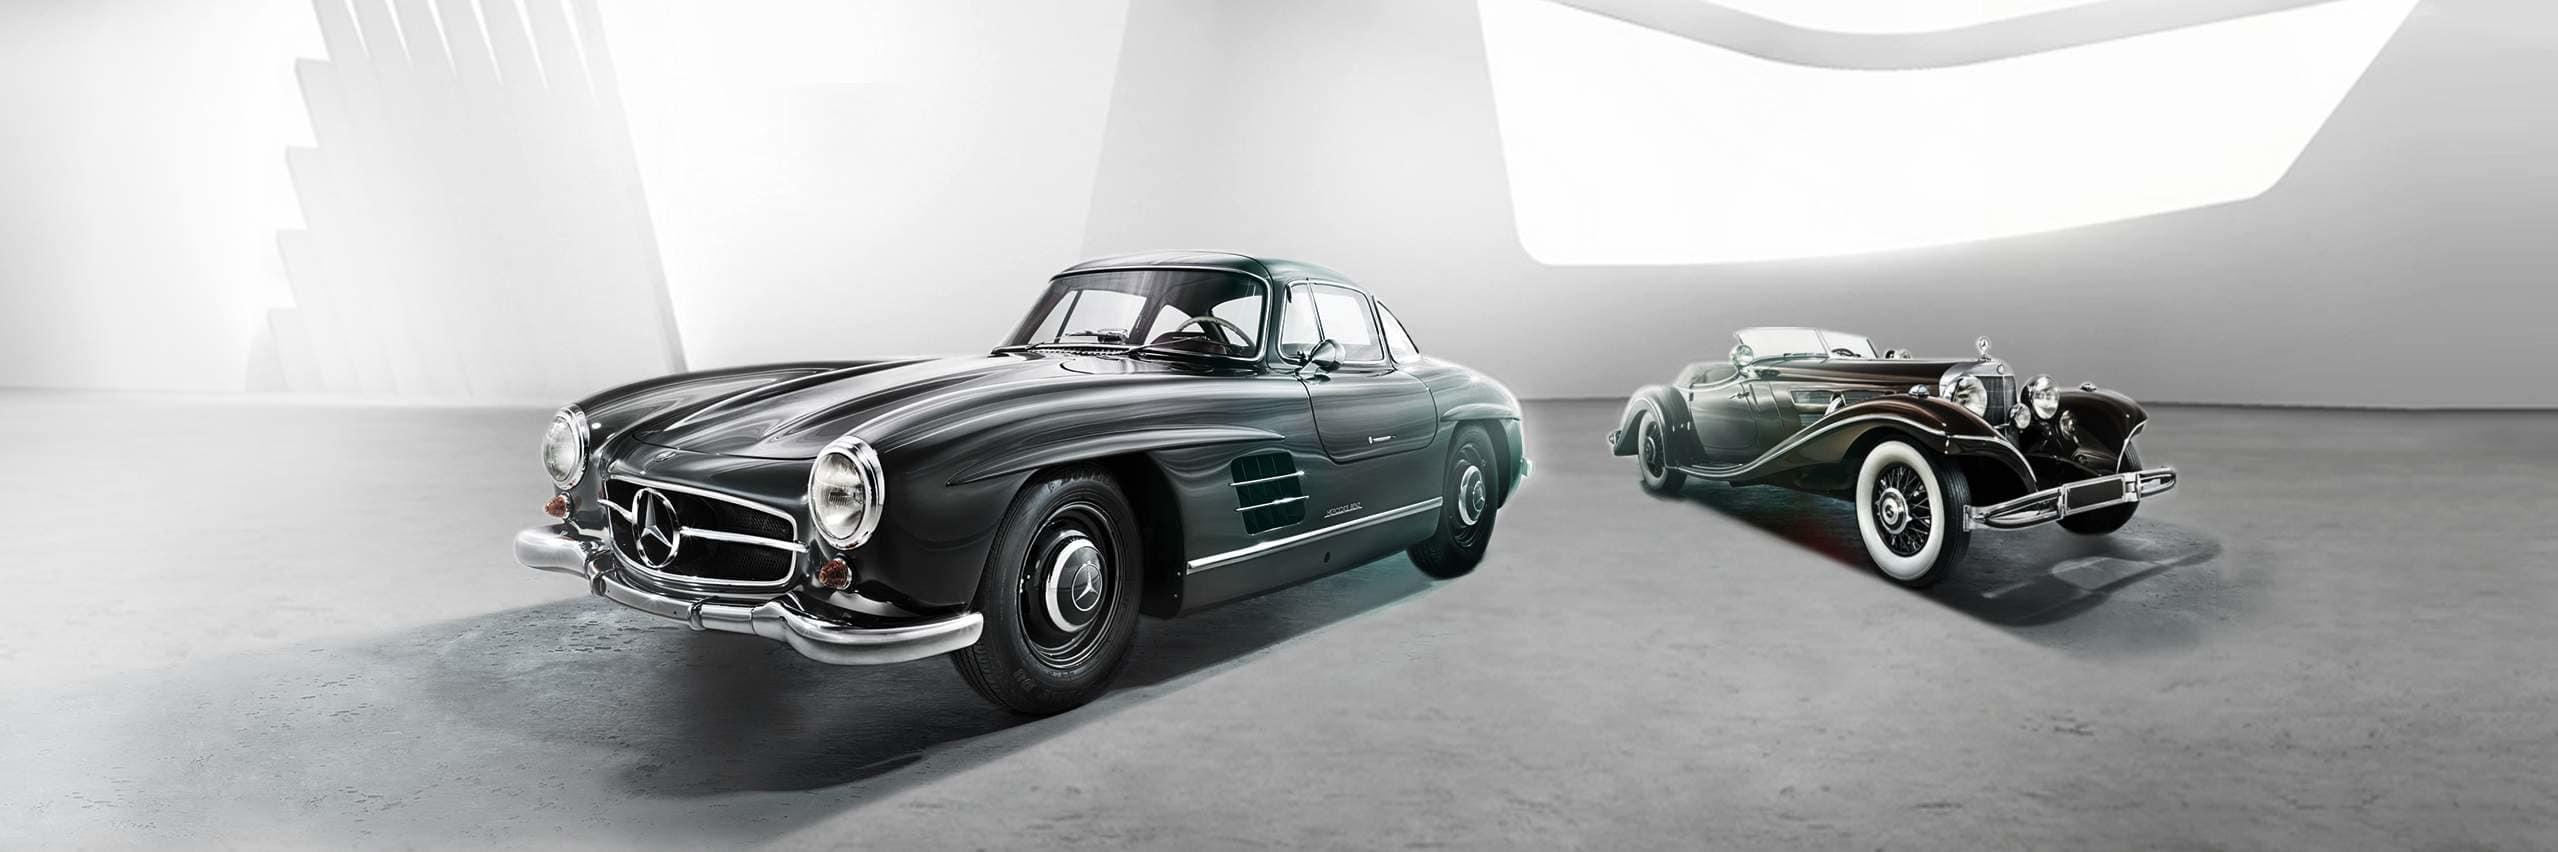 Історія Mercedes-Benz